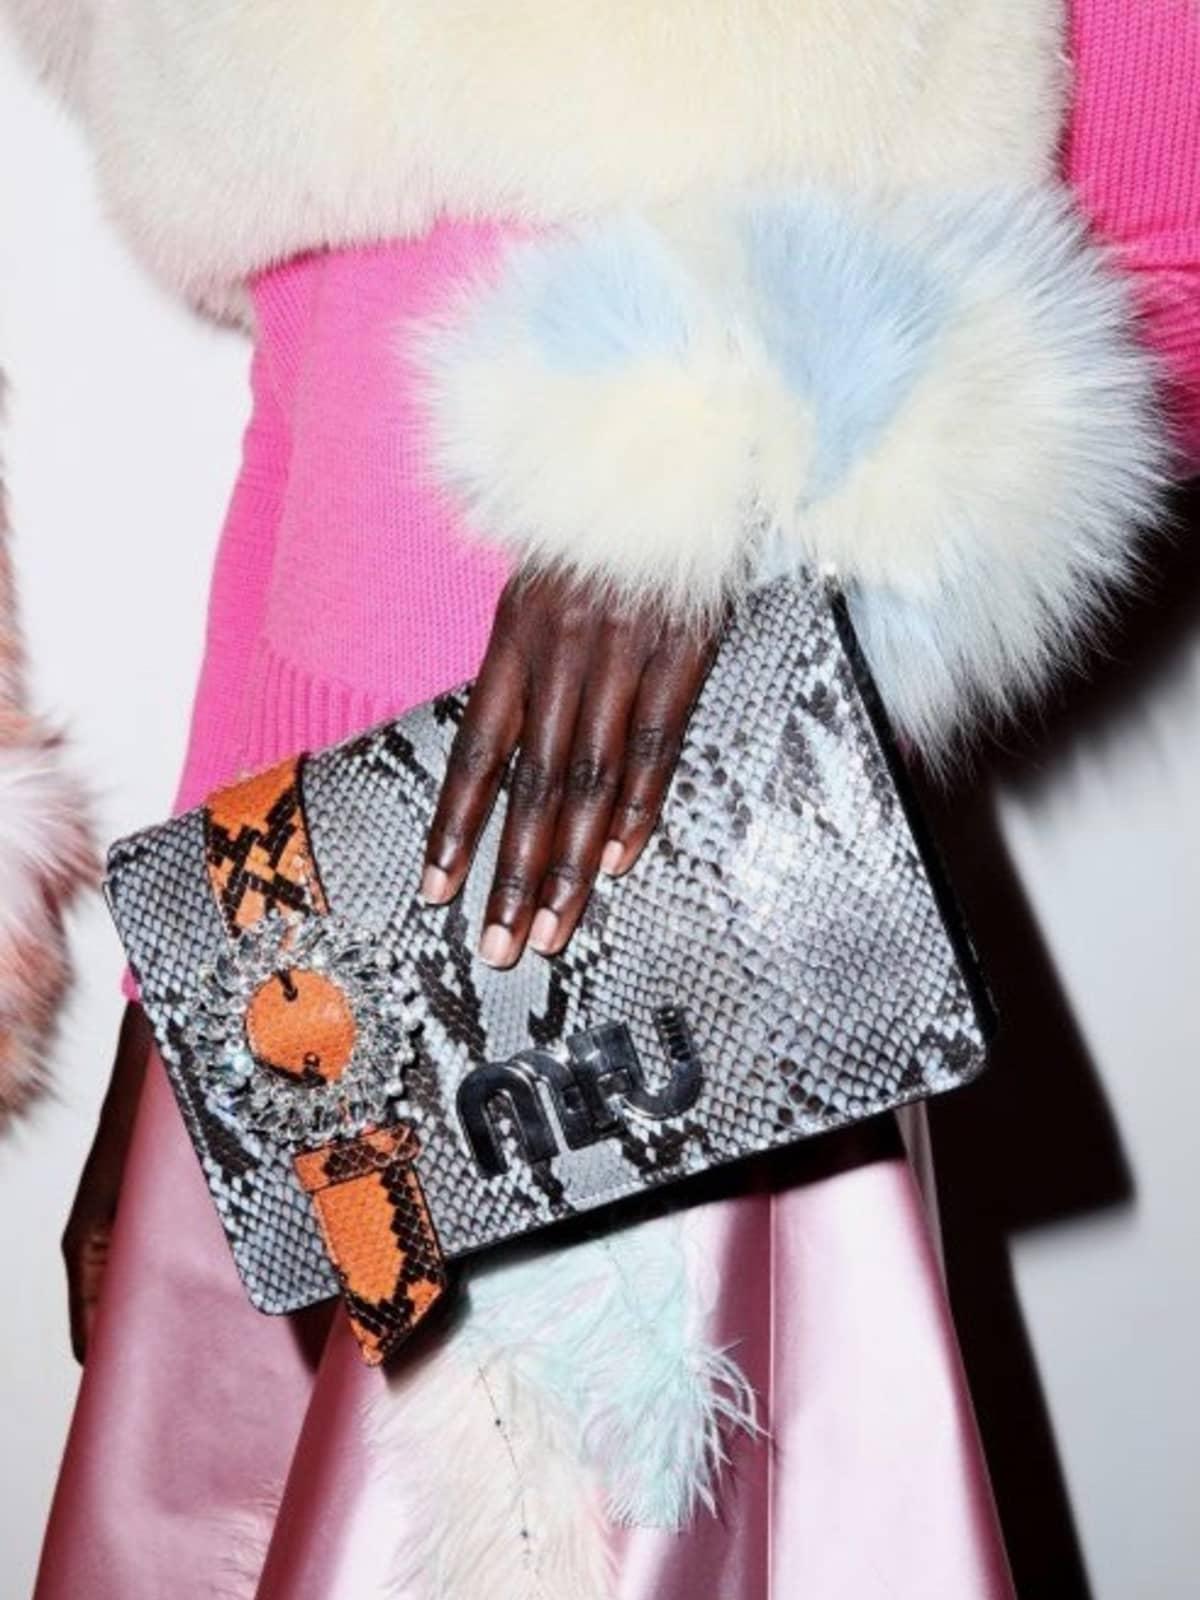 Where to Shop August 2017 Houston- My Miu bag by Miu Miu